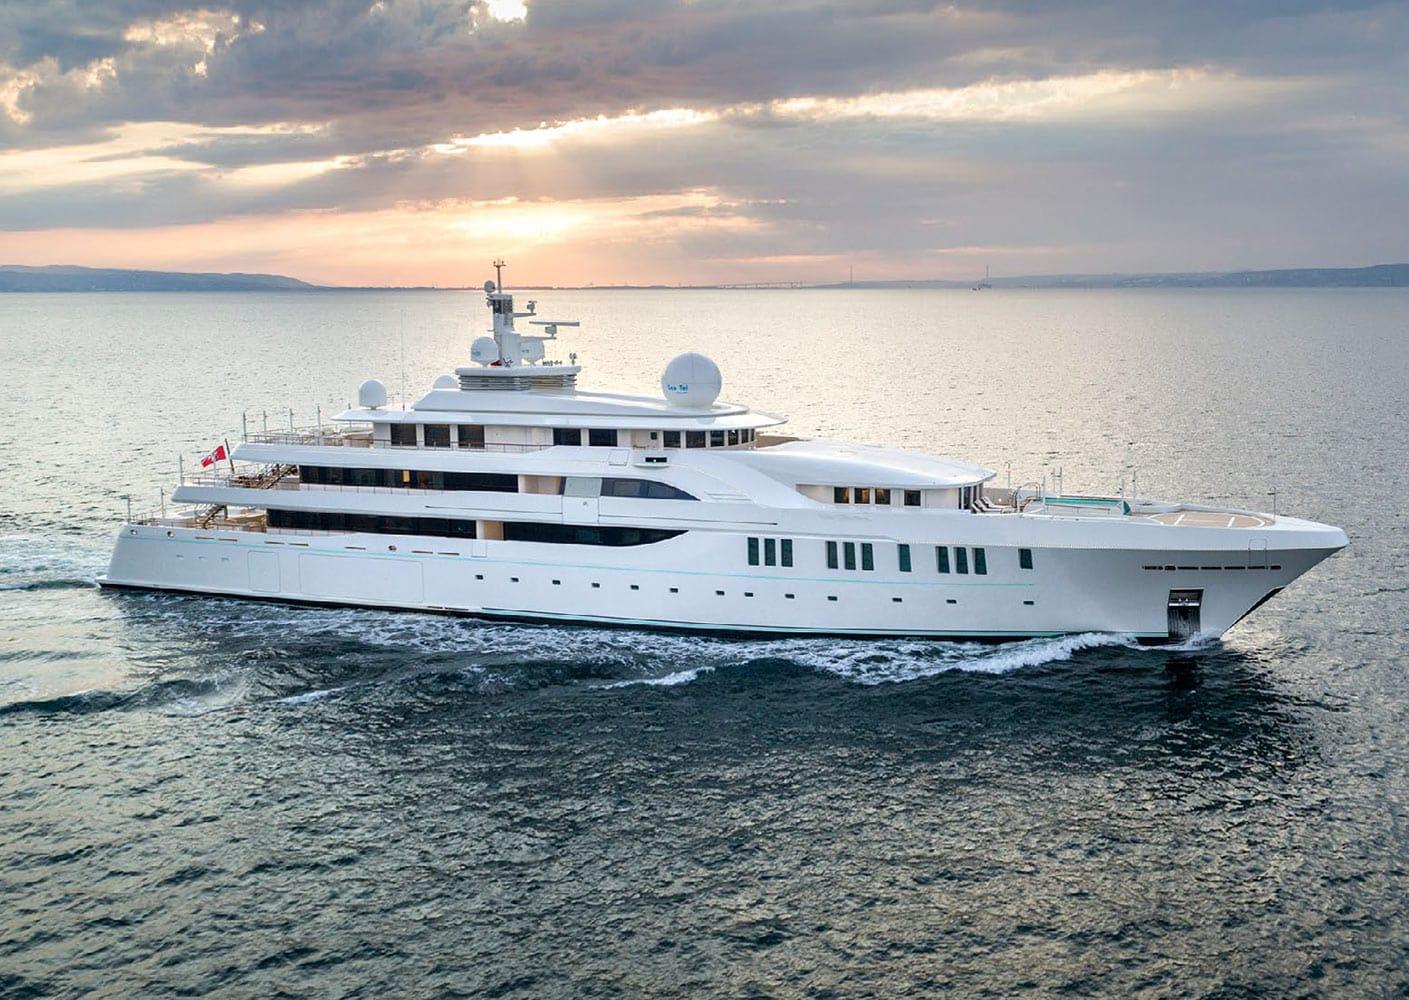 Image of Elements 80.0M (262.5FT) motor yacht